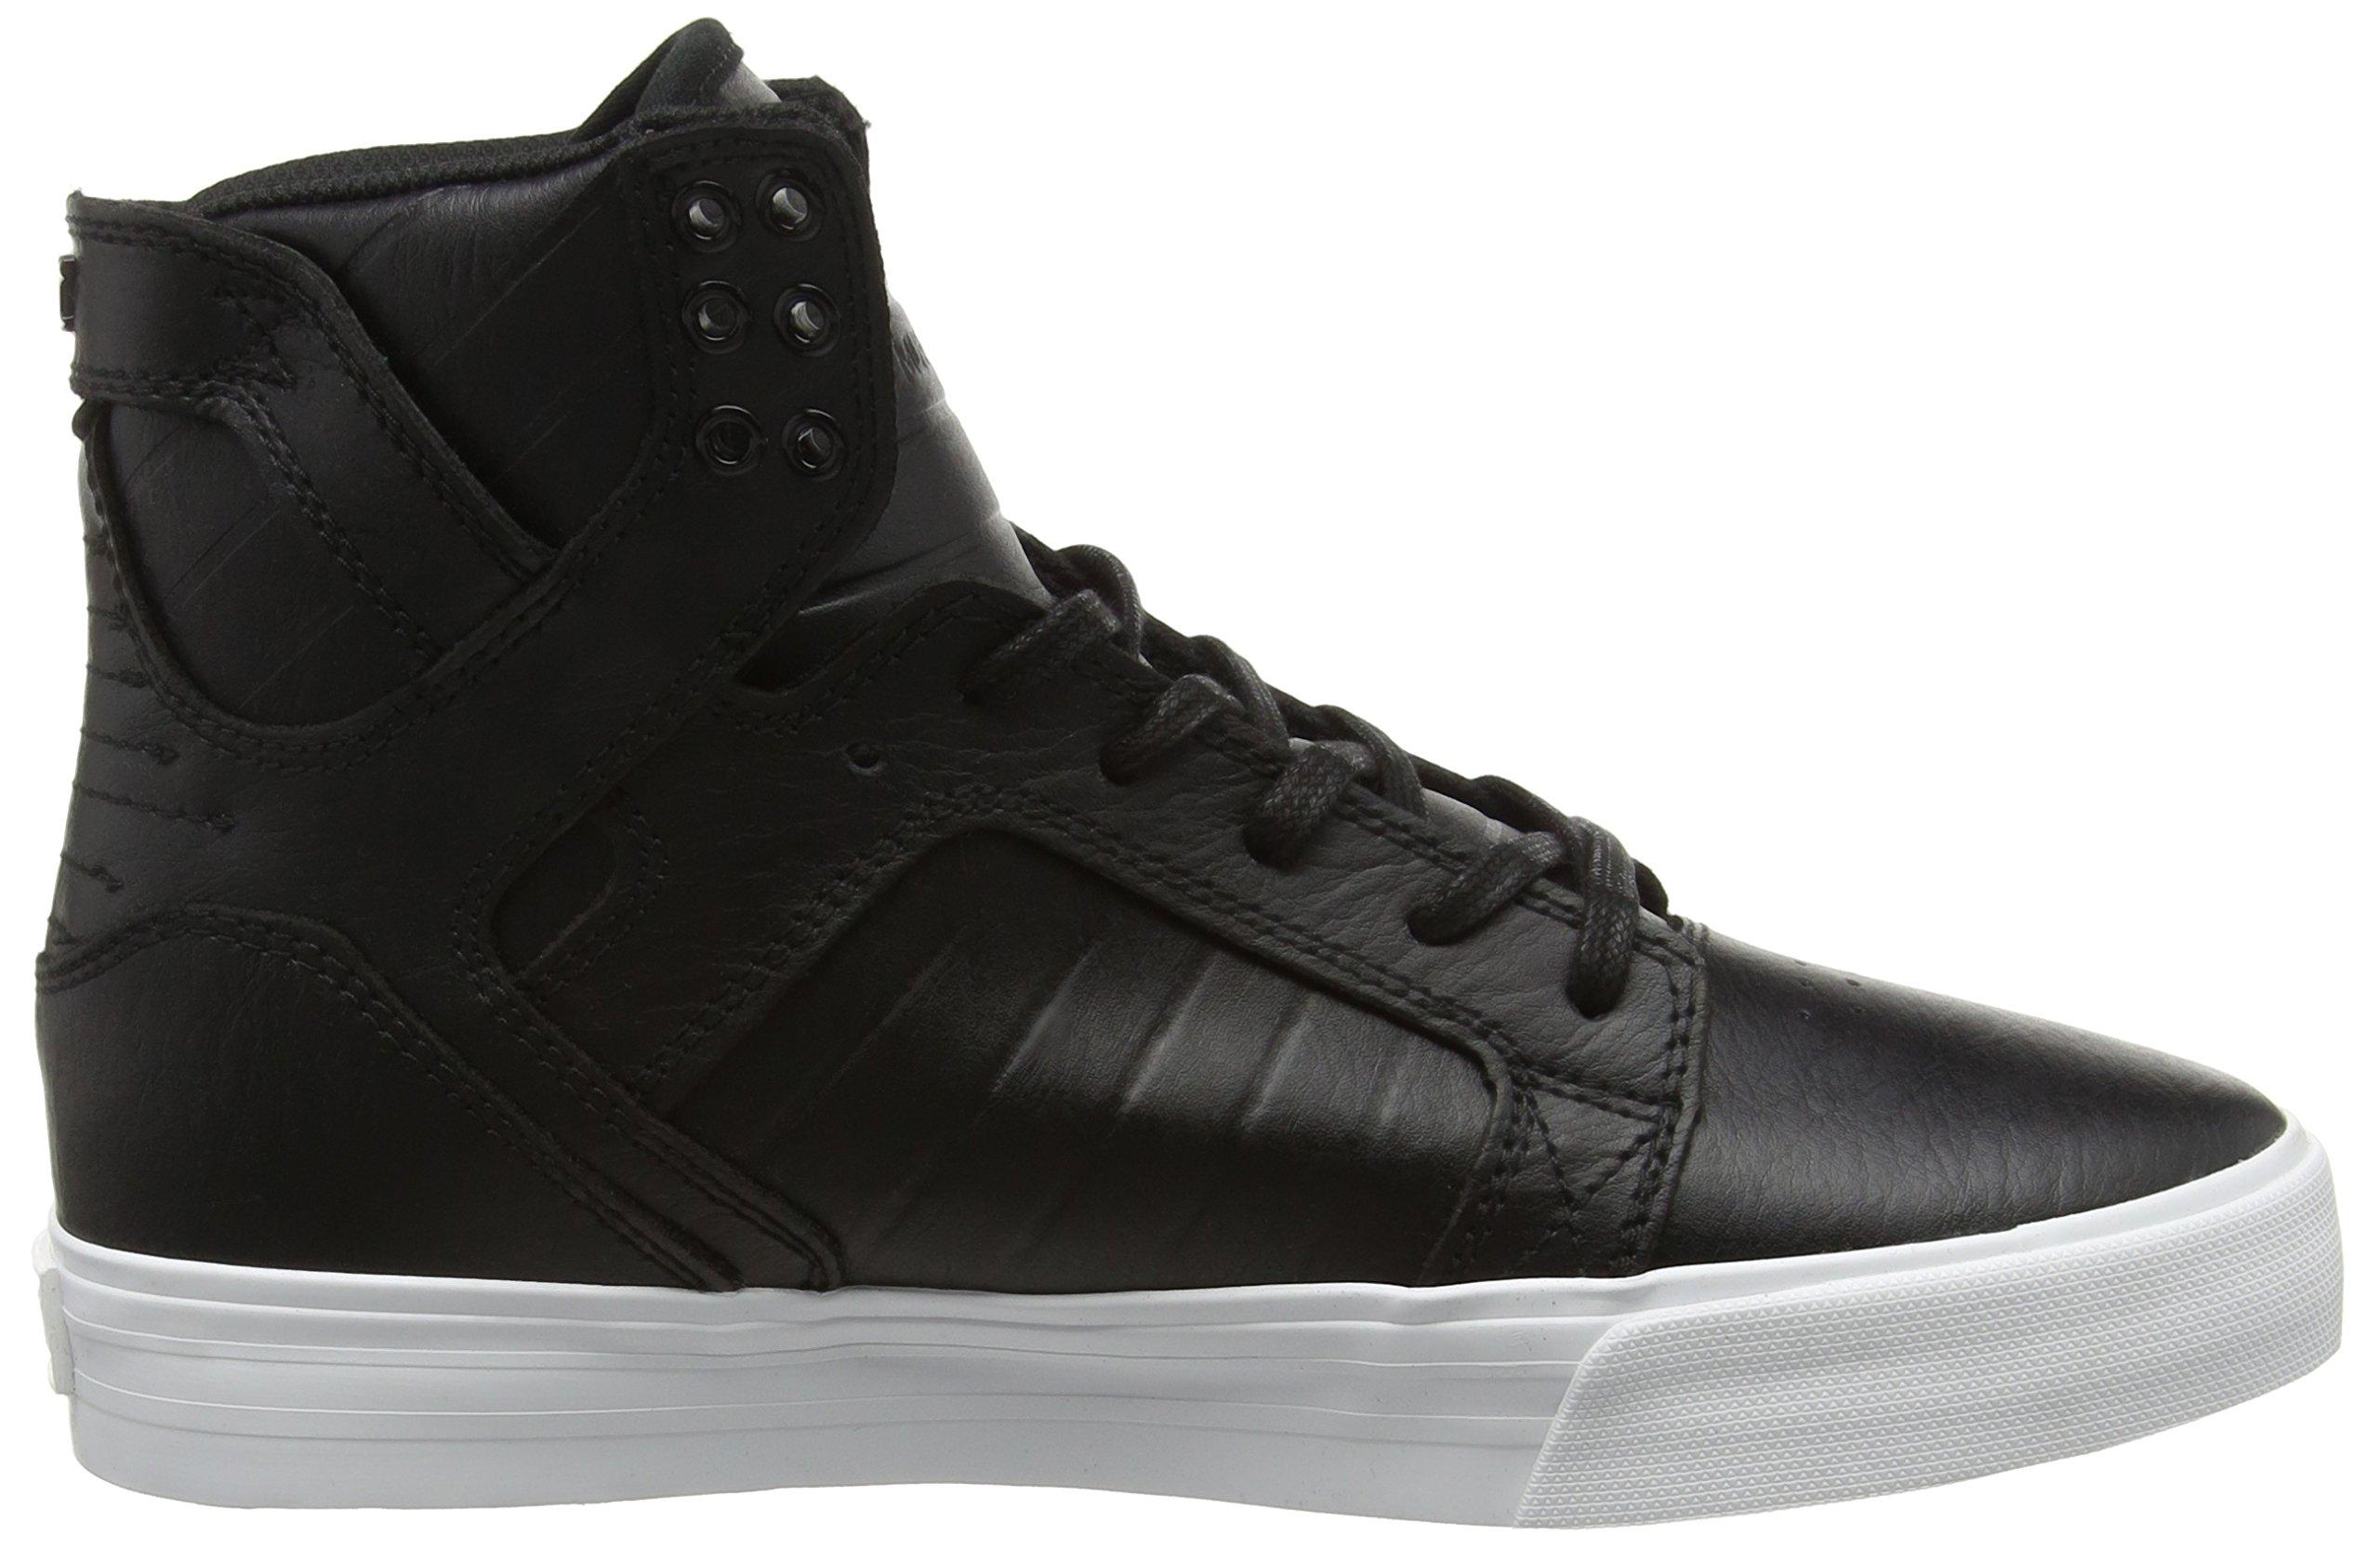 Supra Skytop Skate Shoe, Black/White, 5.5 Regular US by Supra (Image #6)